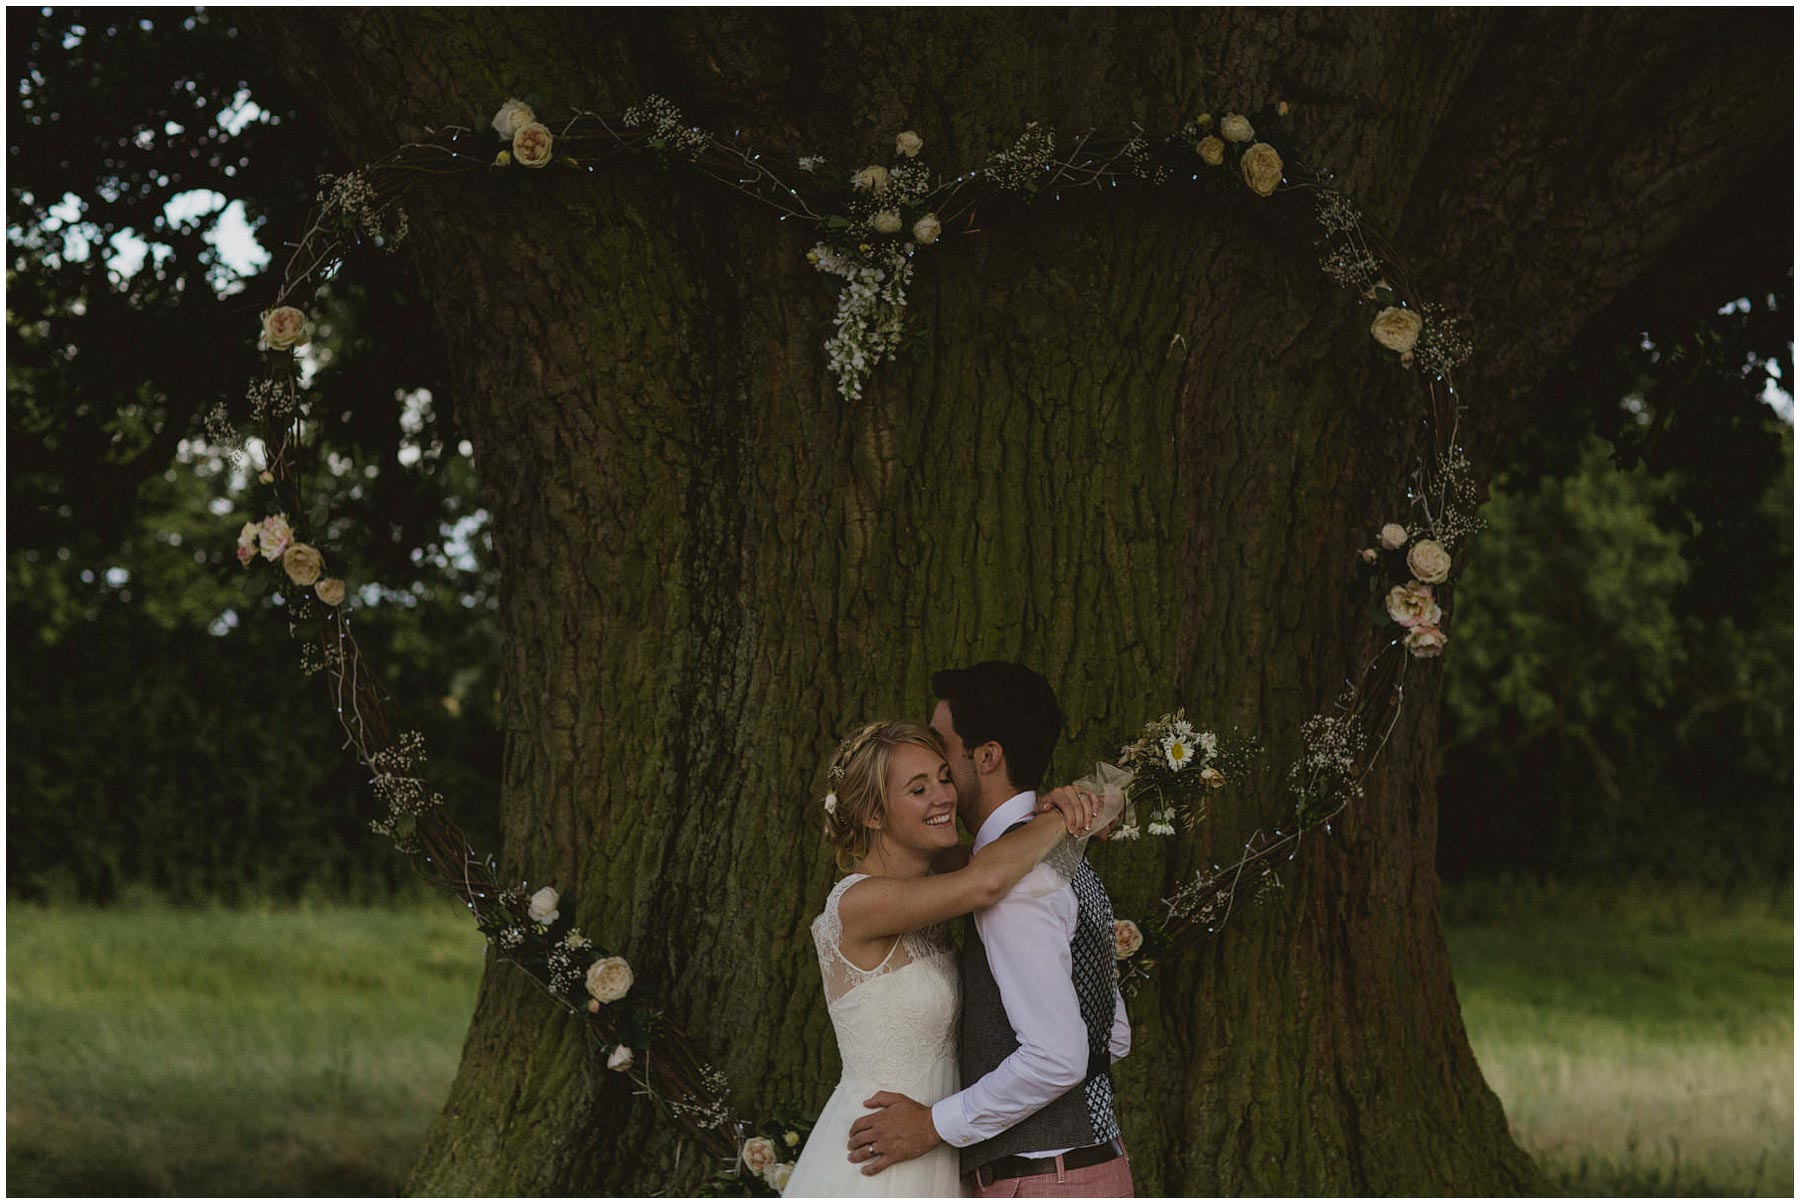 Kent-Festival-Tipi-wedding-photography_0144